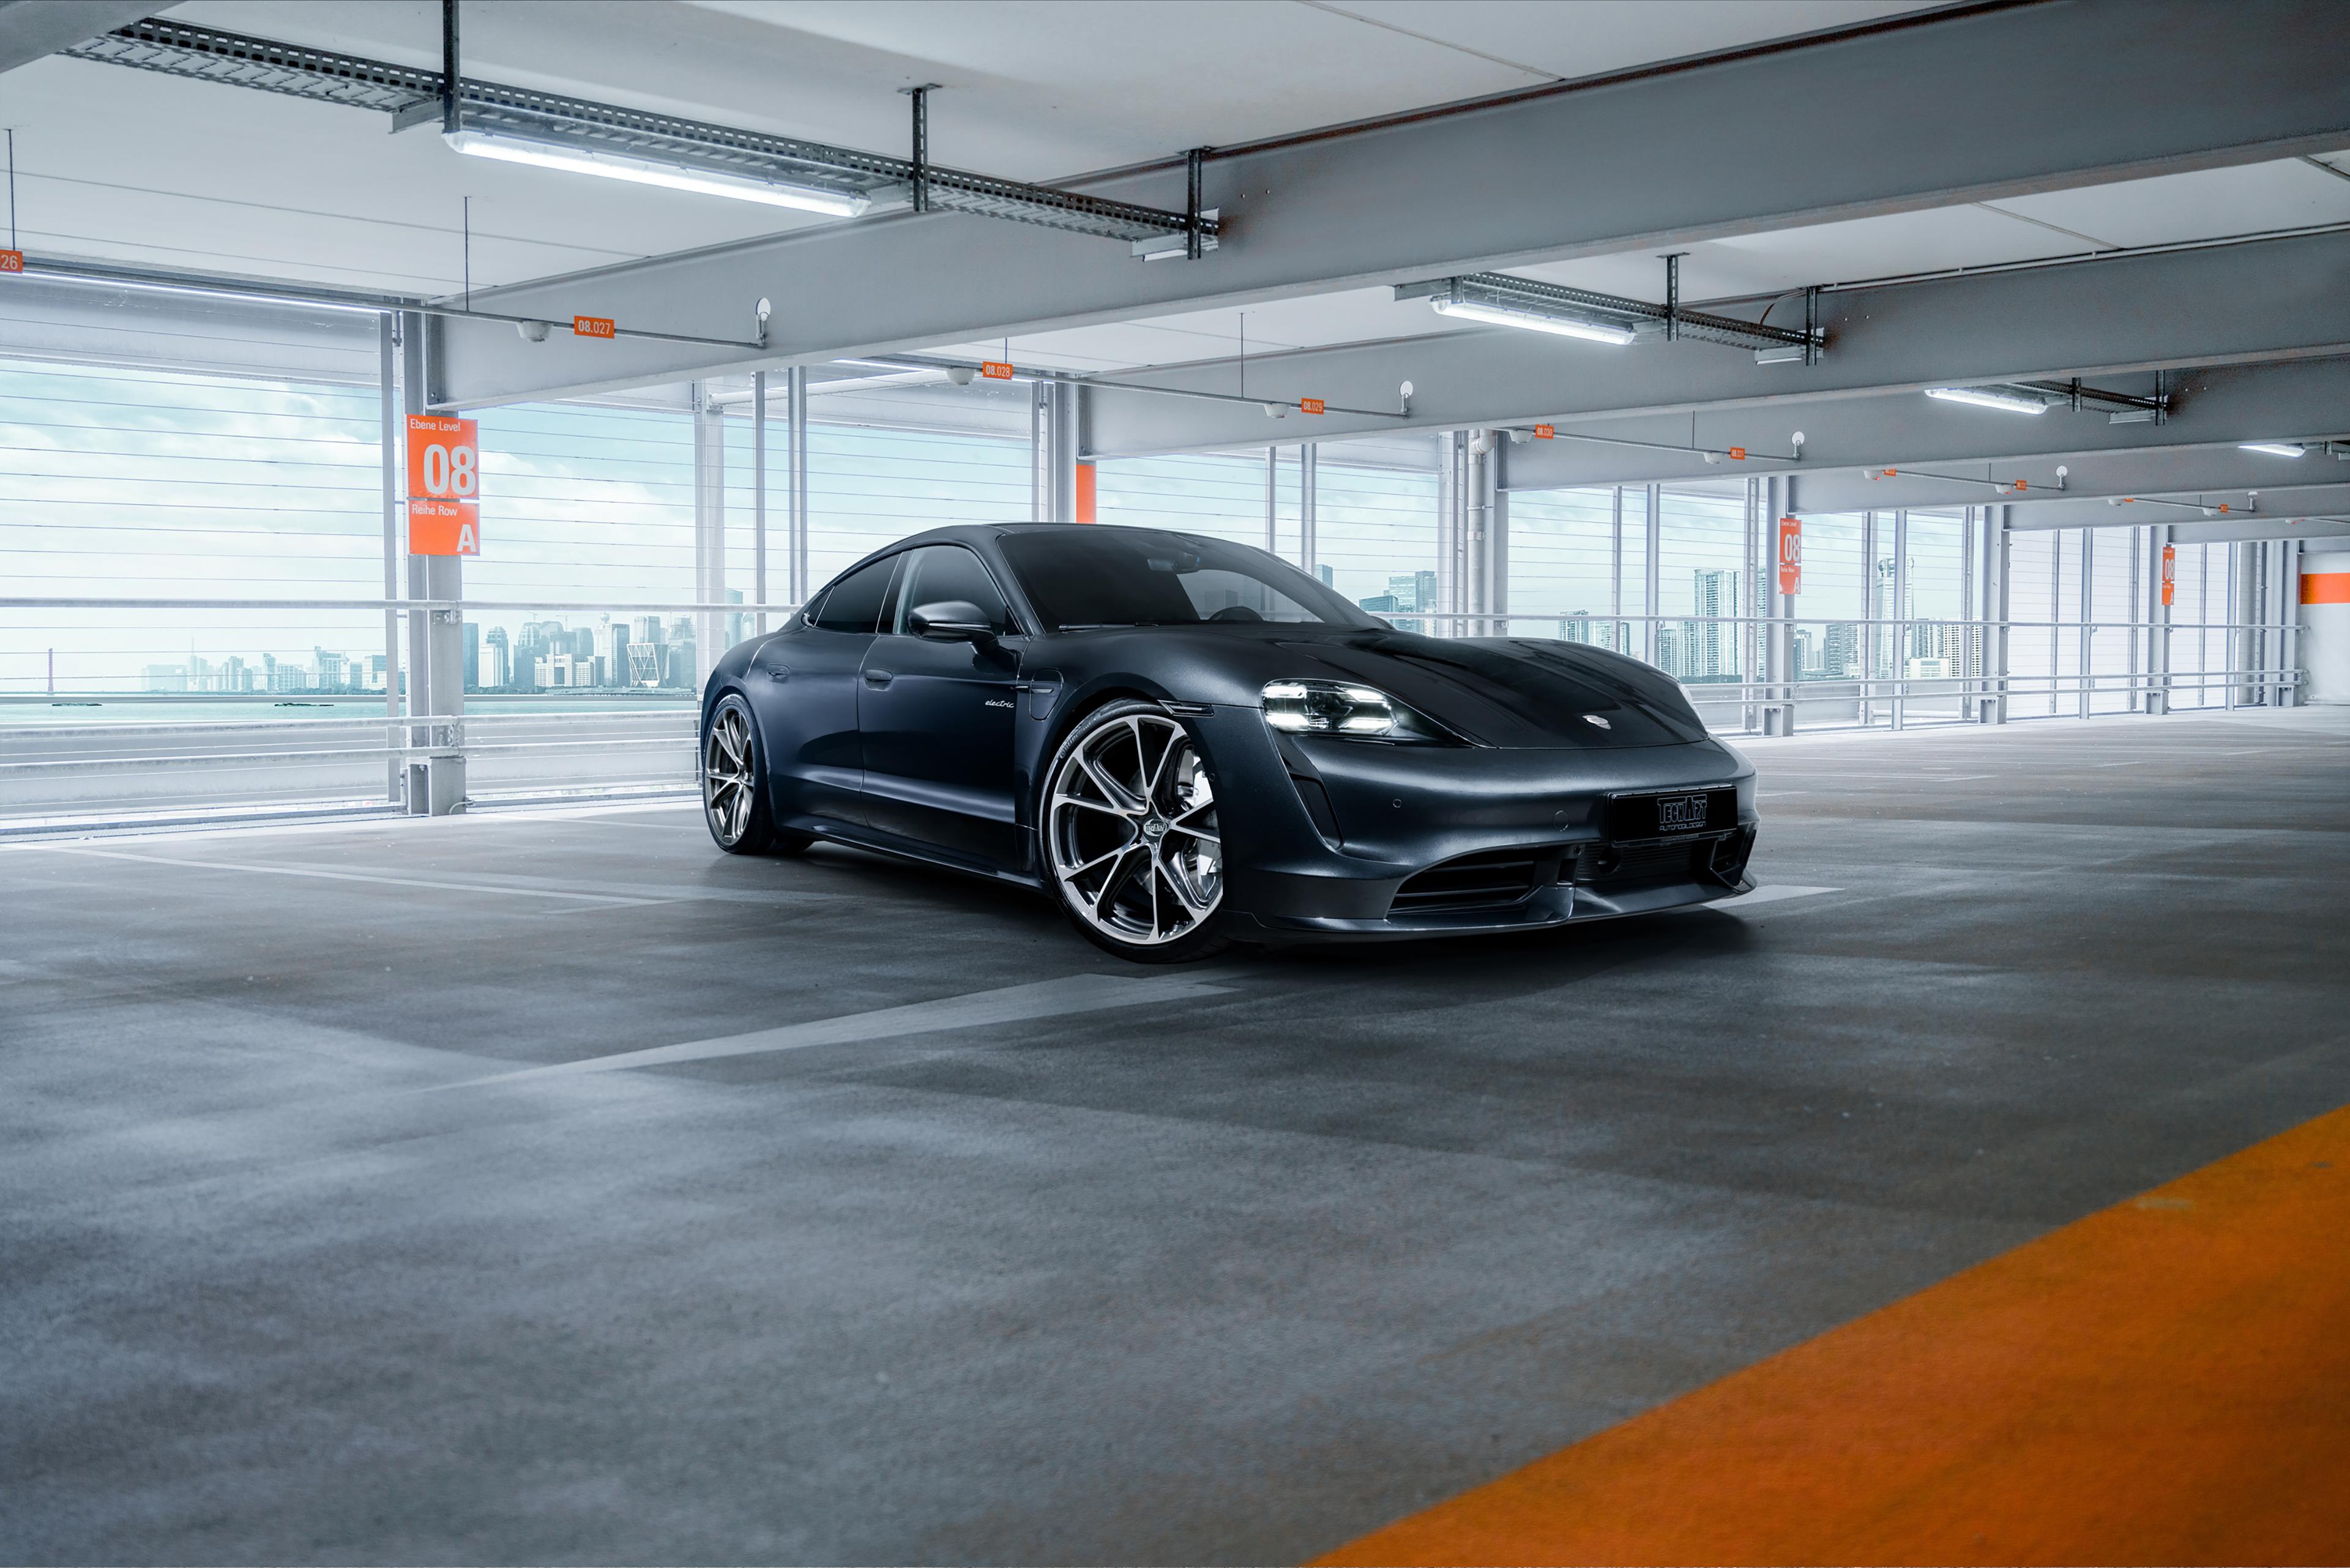 Porsche Taycan Turbo 4k Wallpaper Techart 2020 Cars 1453